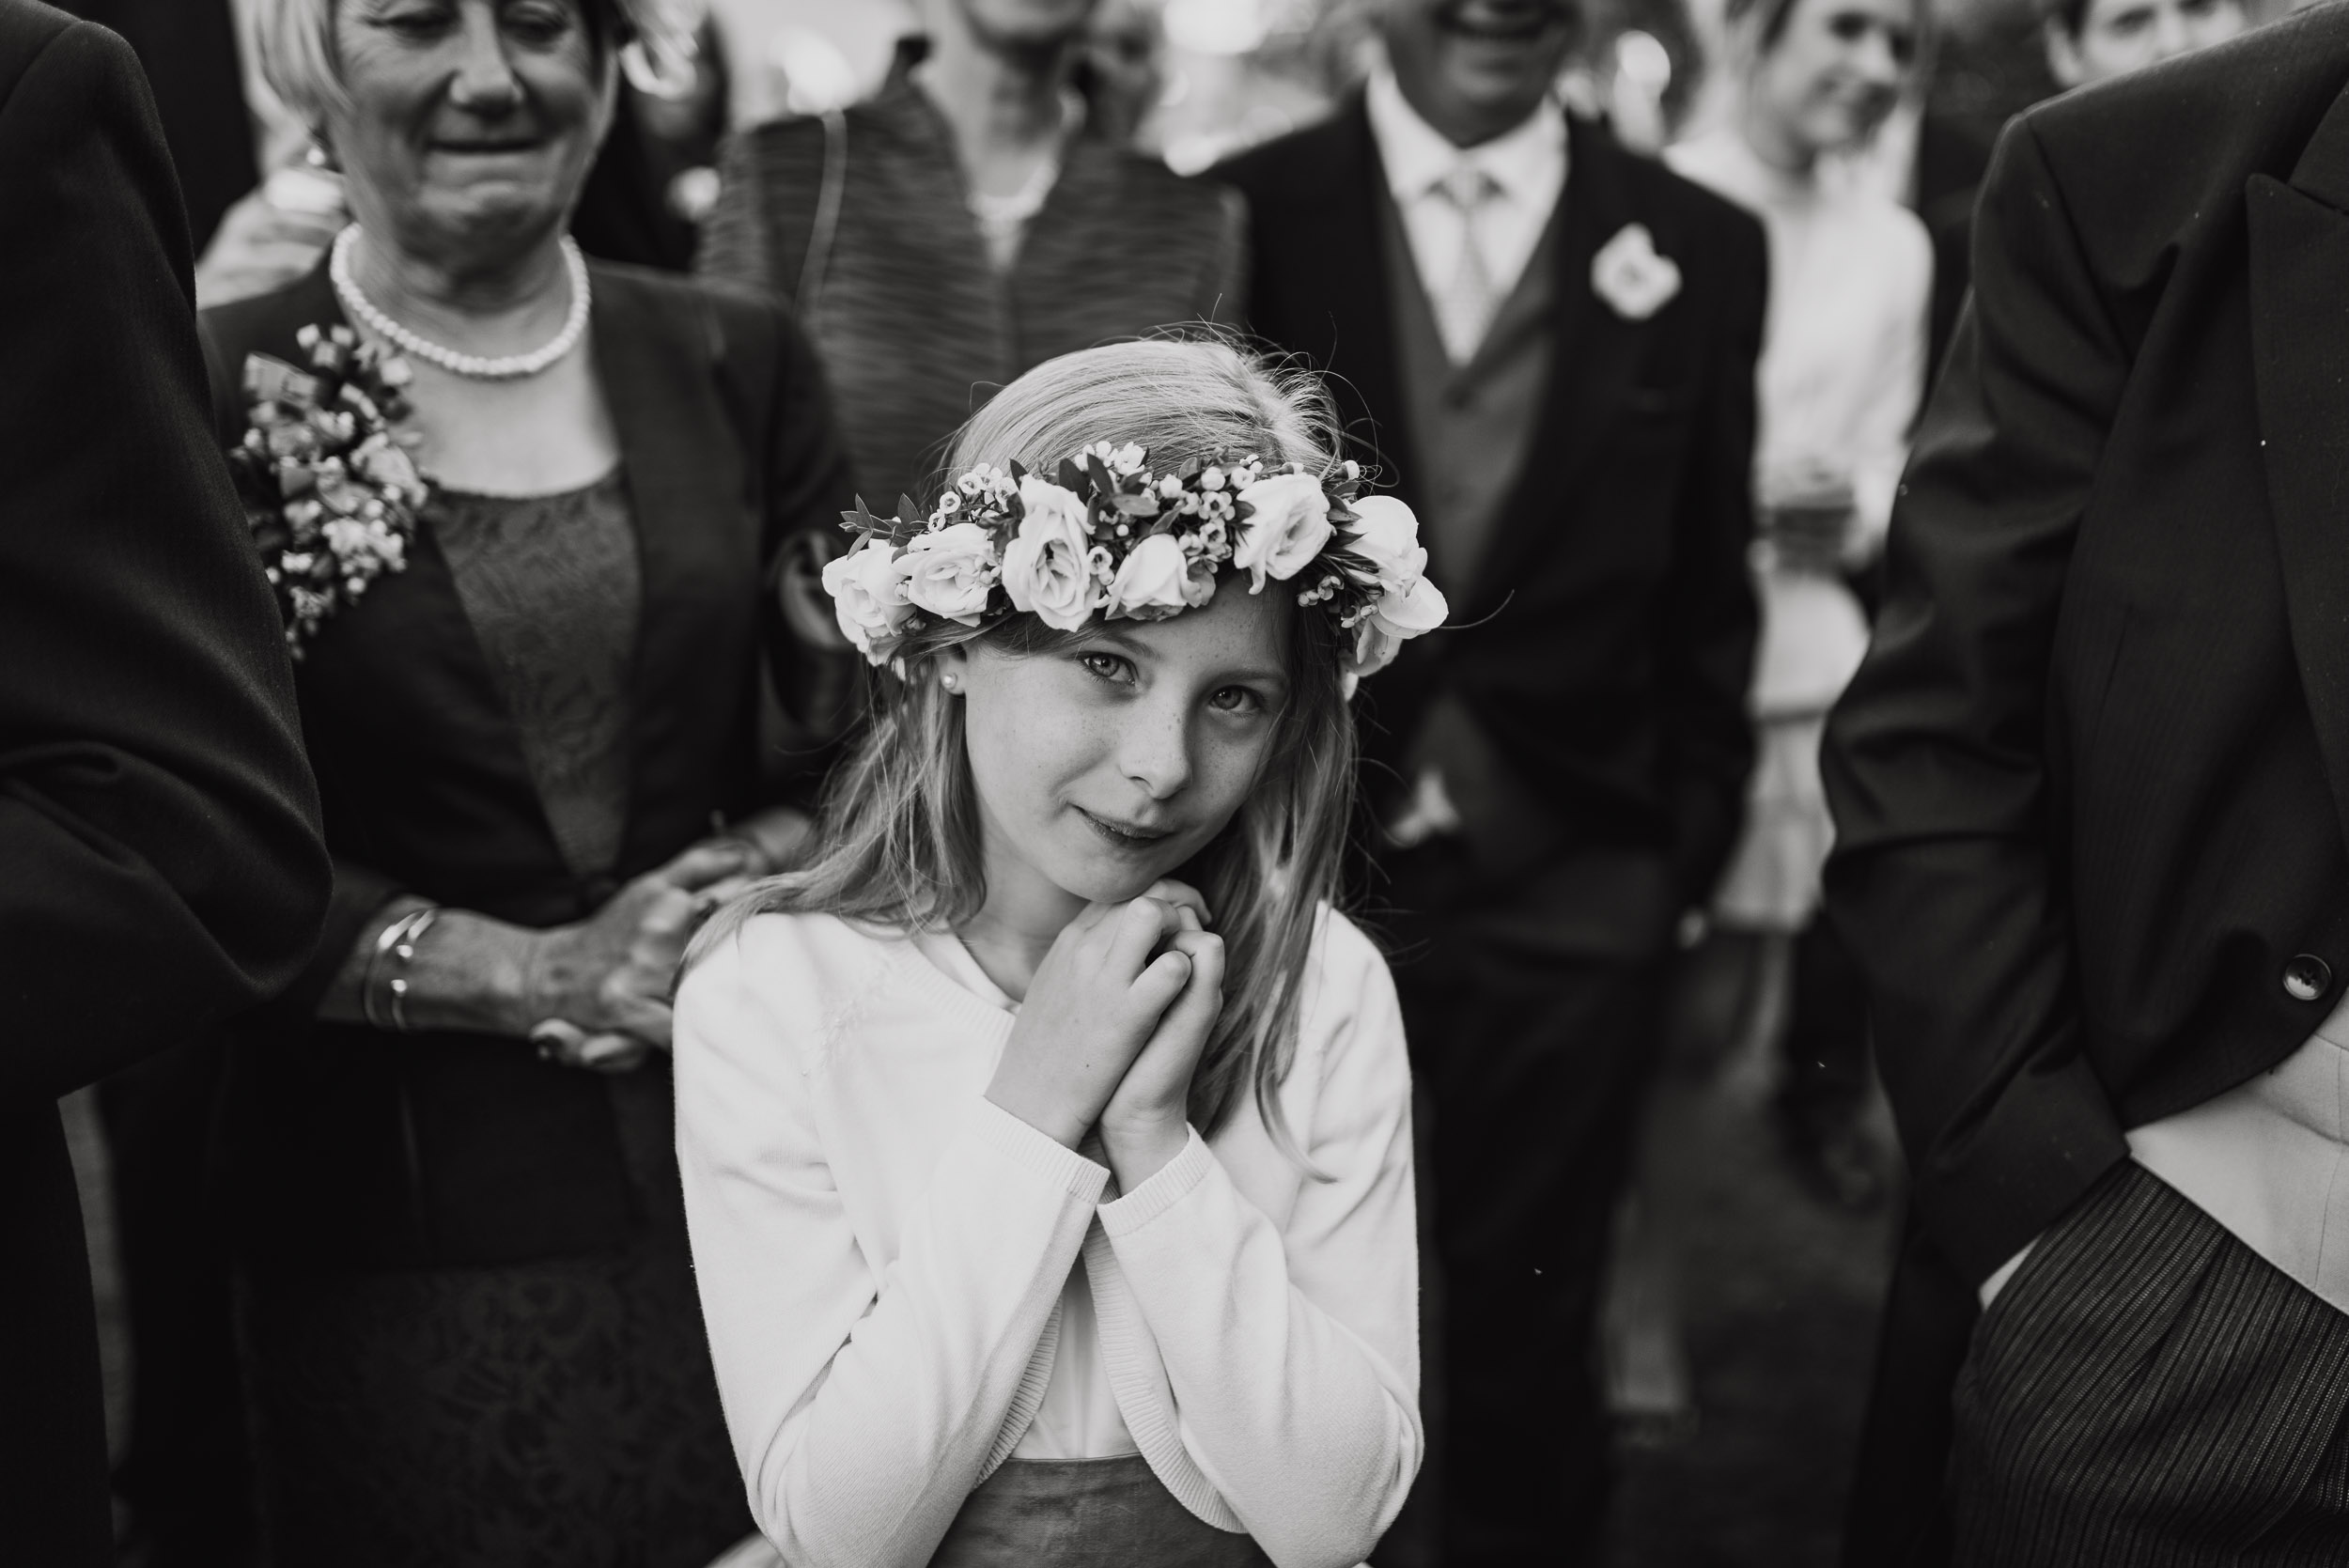 hamswell-house-wedding-photographer-w97.jpg